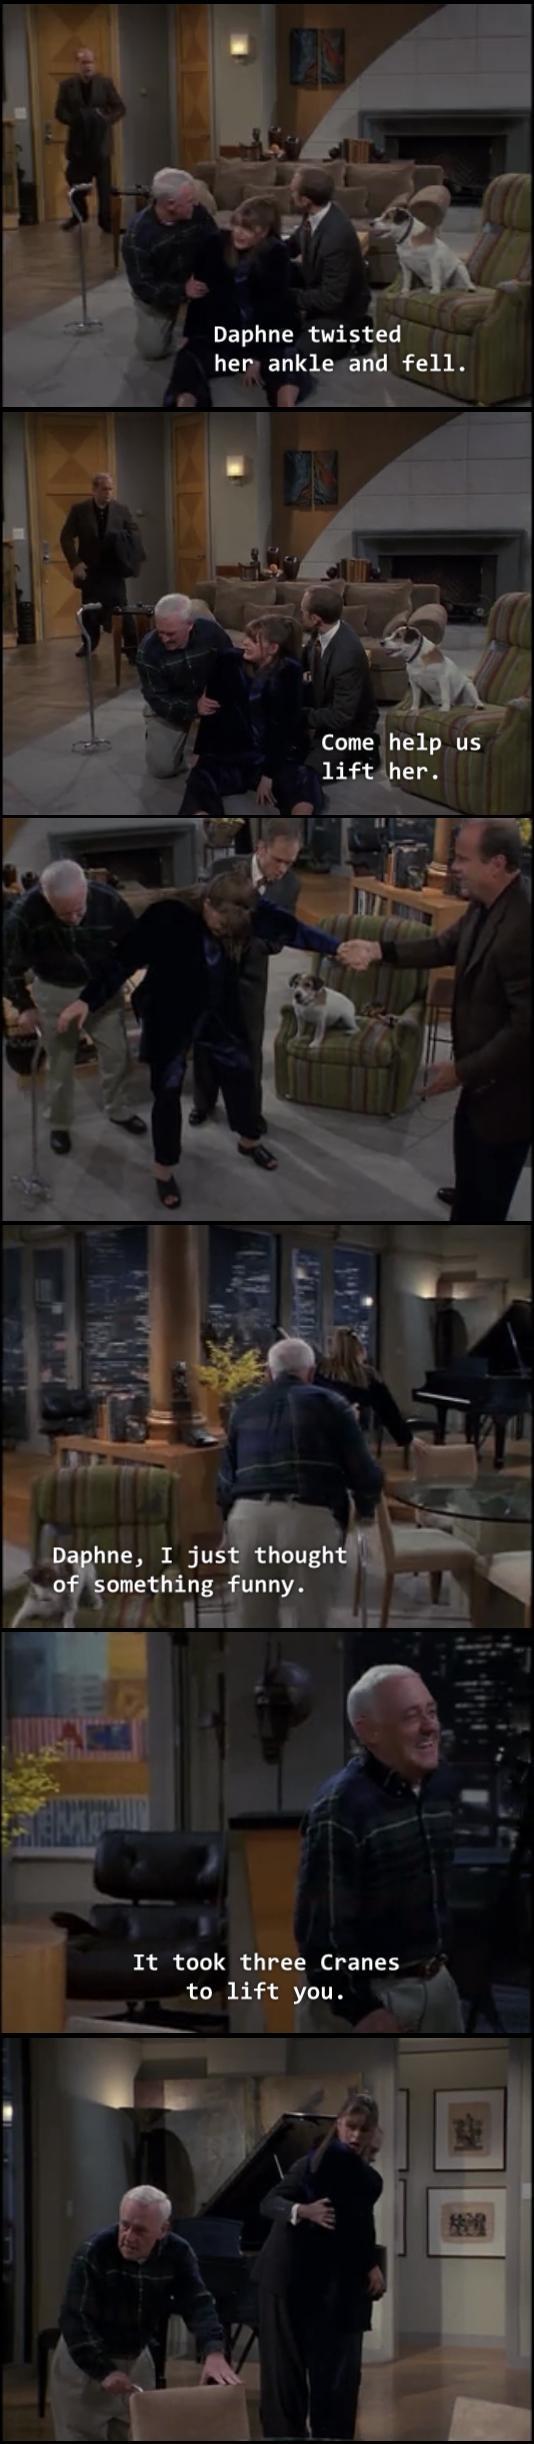 Marty Crane Is Definitely A Comedic Genius Meme Guy